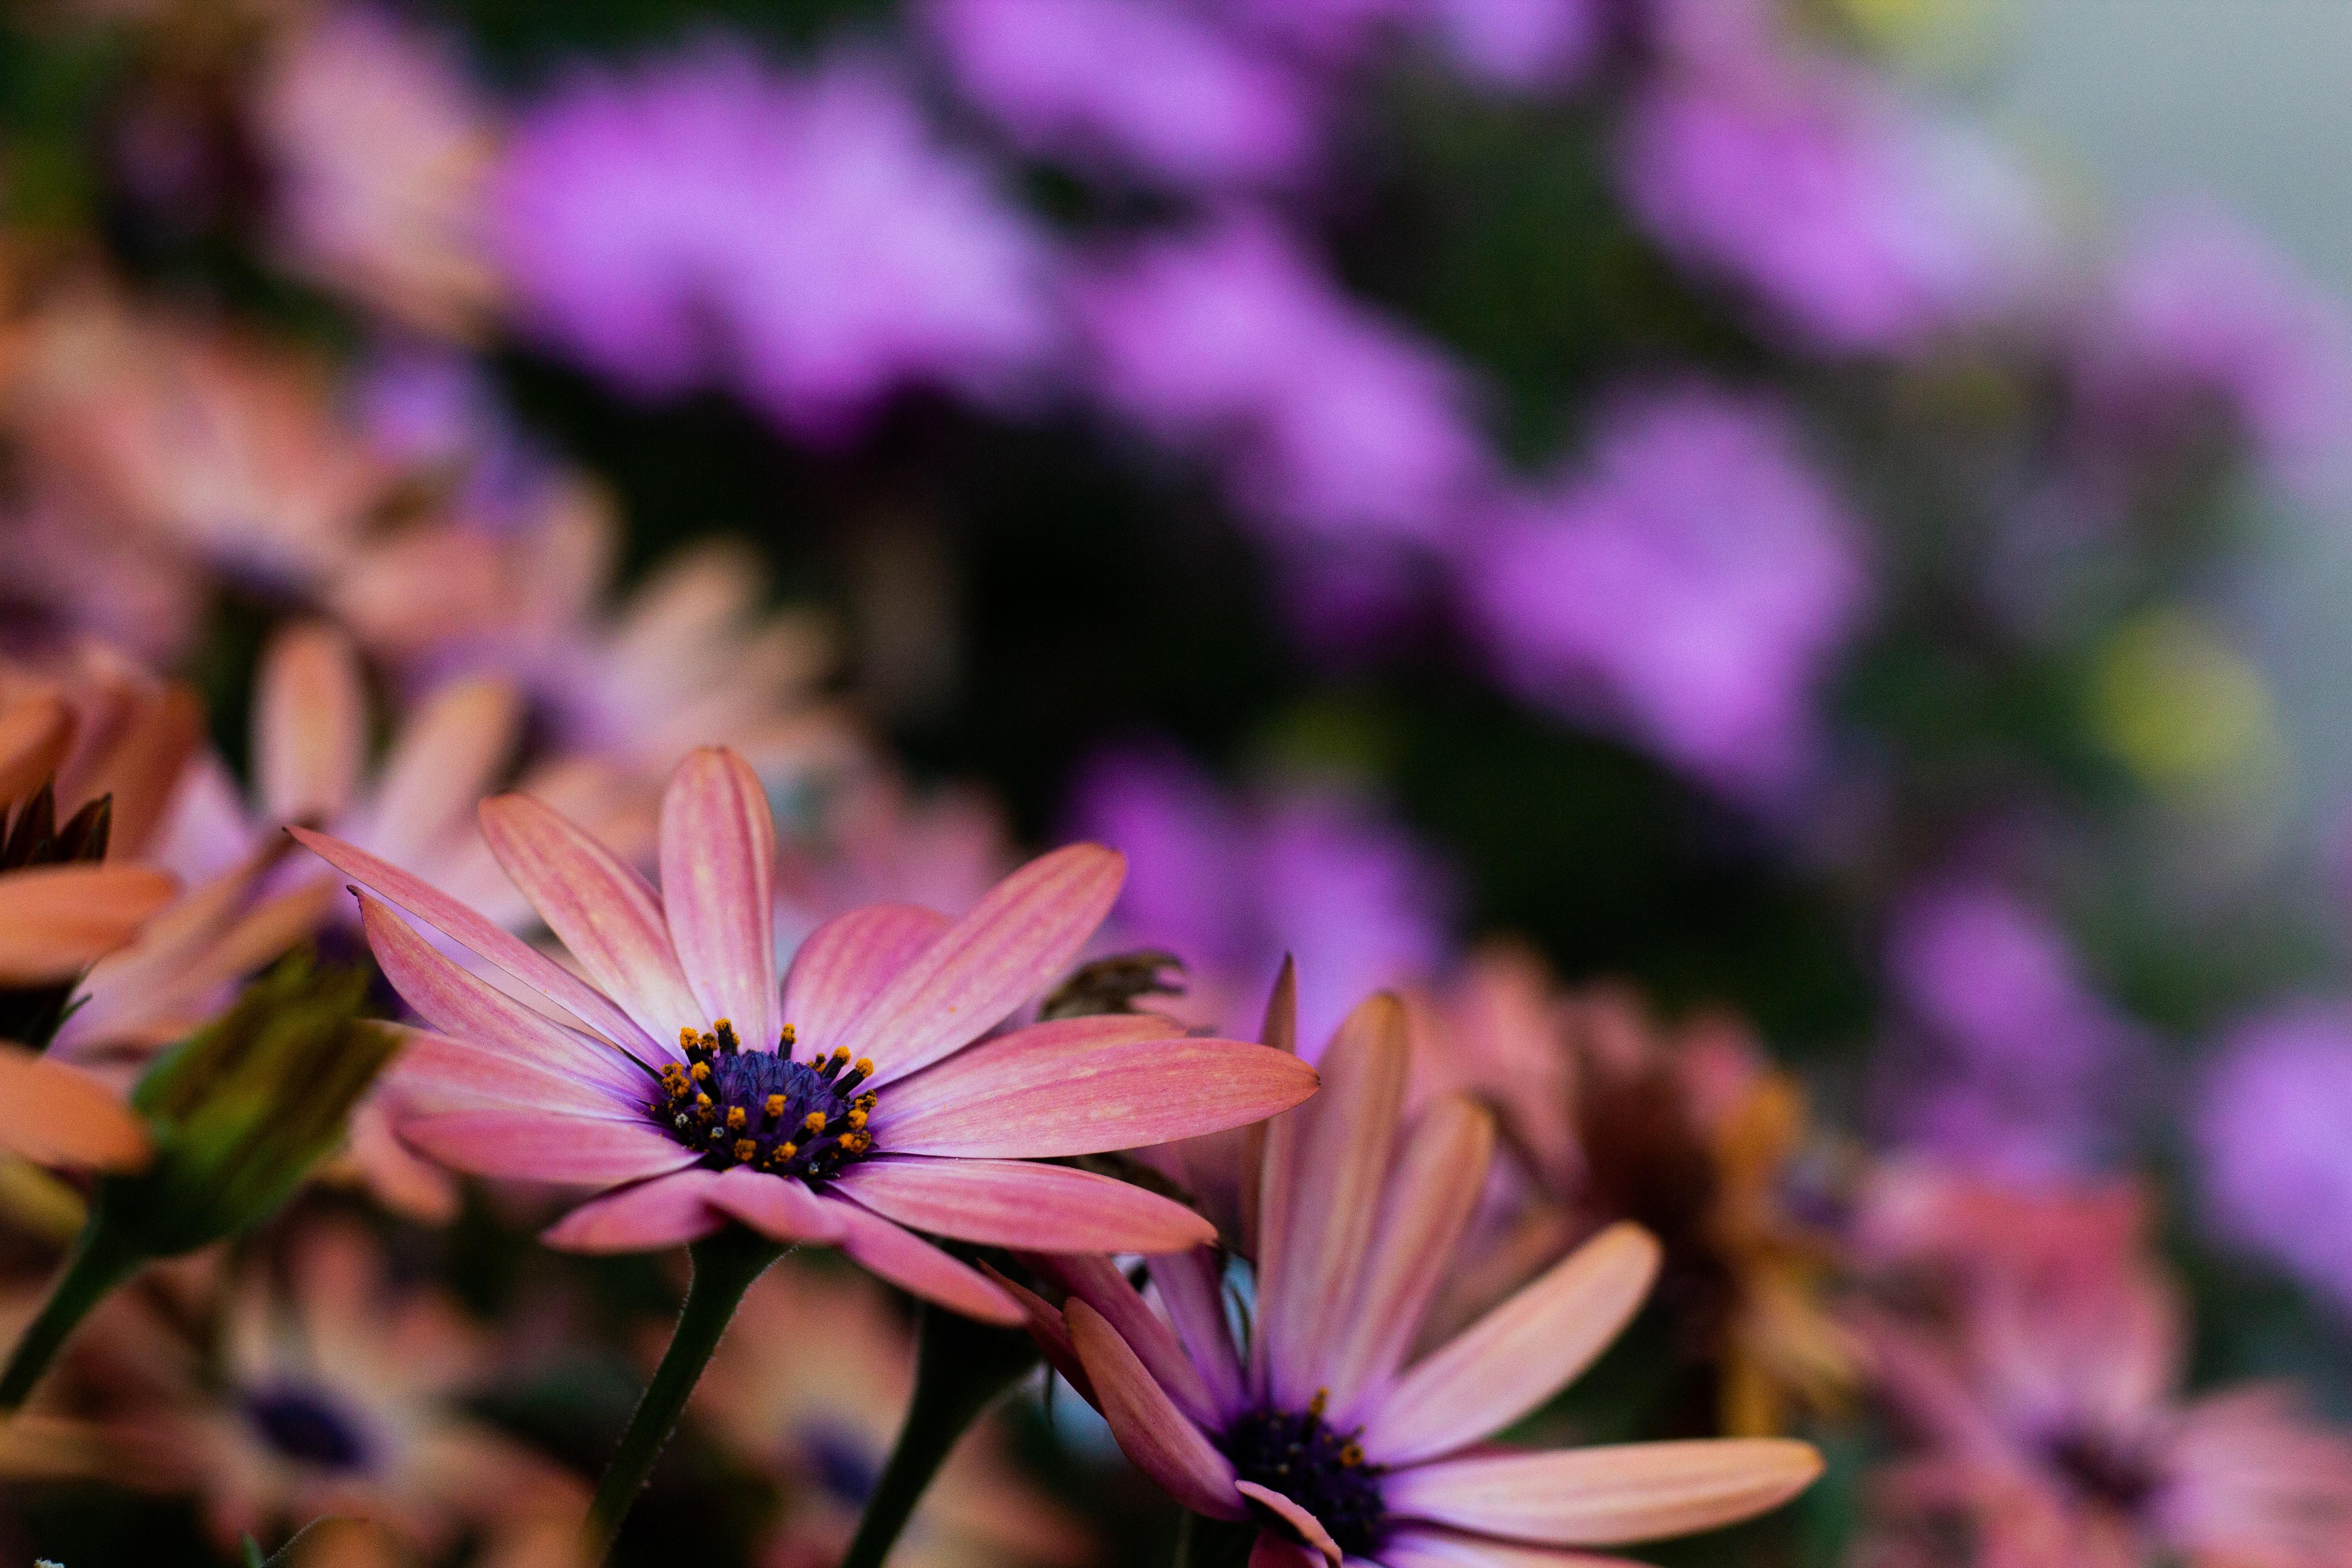 orange osteospermum flowers in bloom